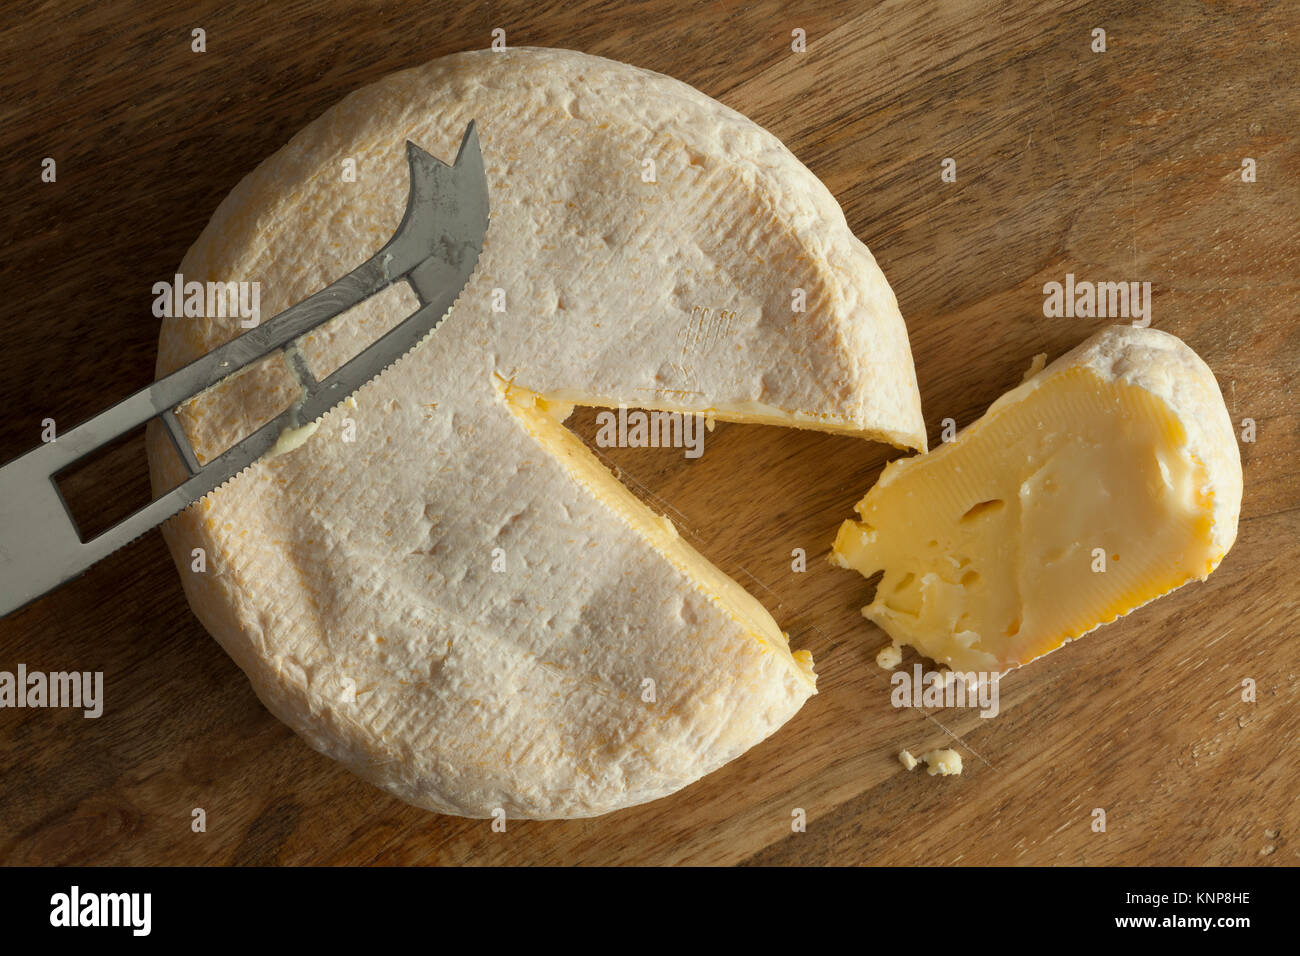 Reblochon de Savoie cheese from raw cows milk with a slice - Stock Image